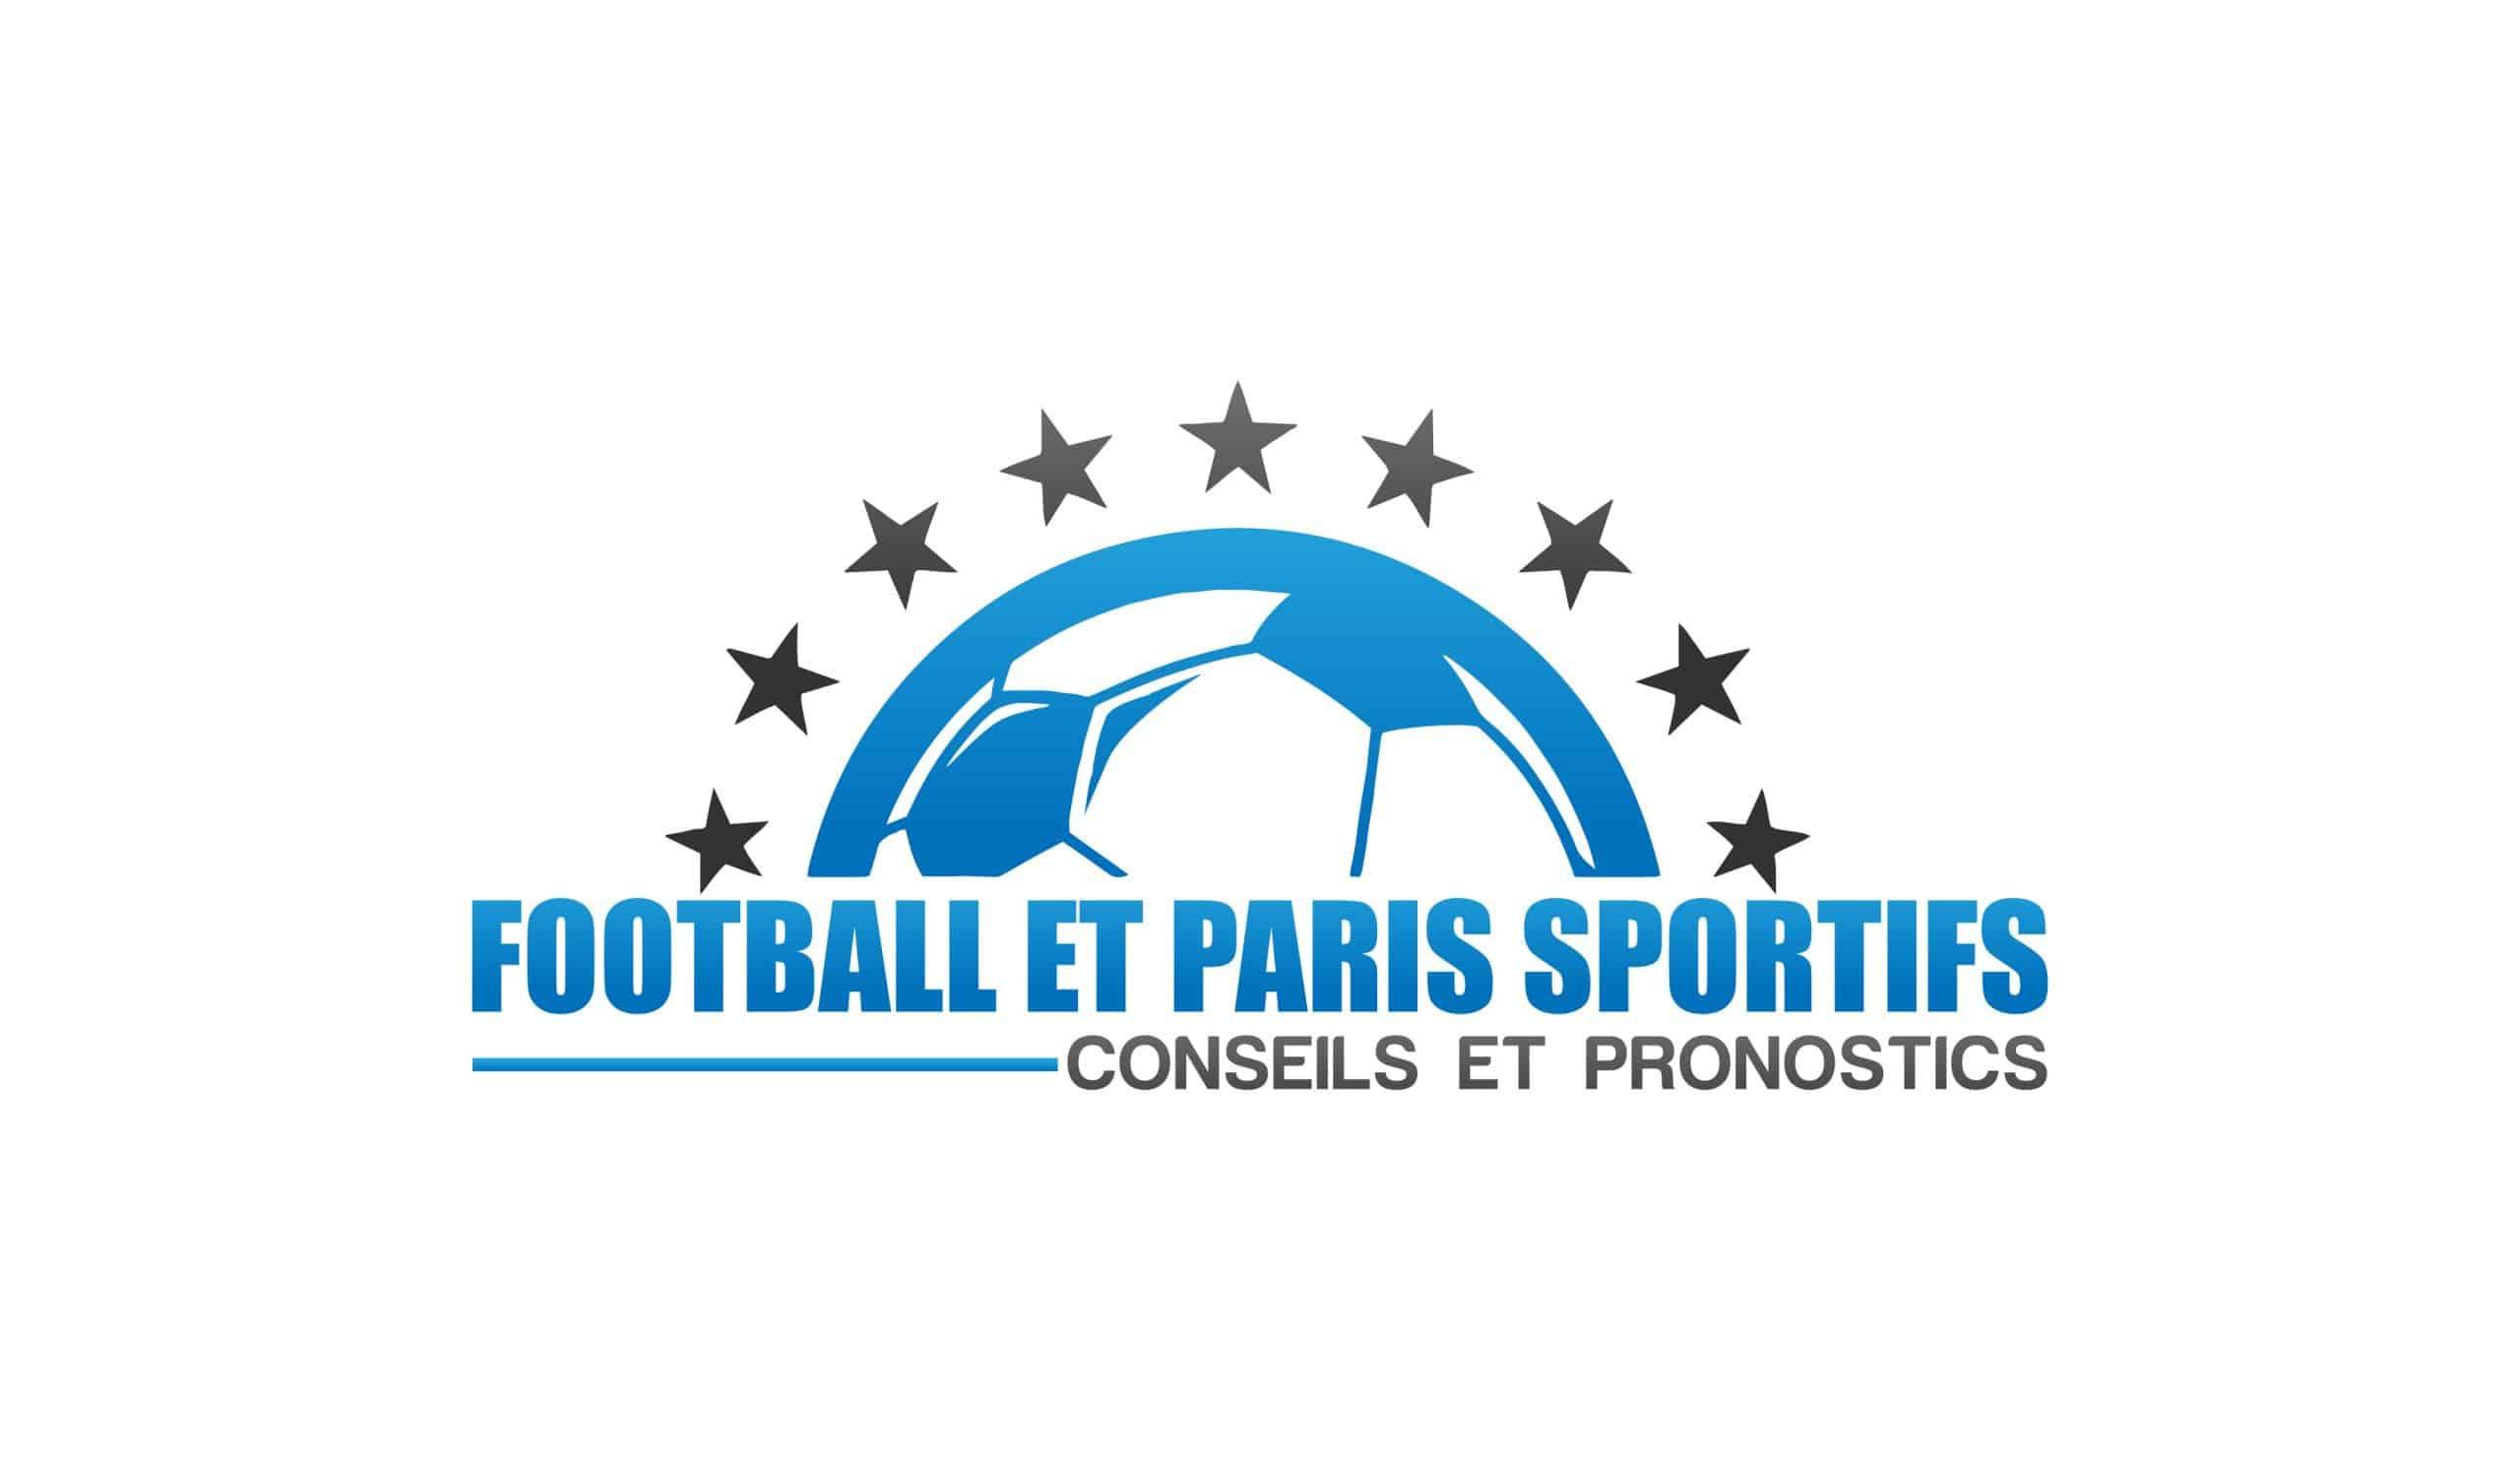 Paris sportifs football